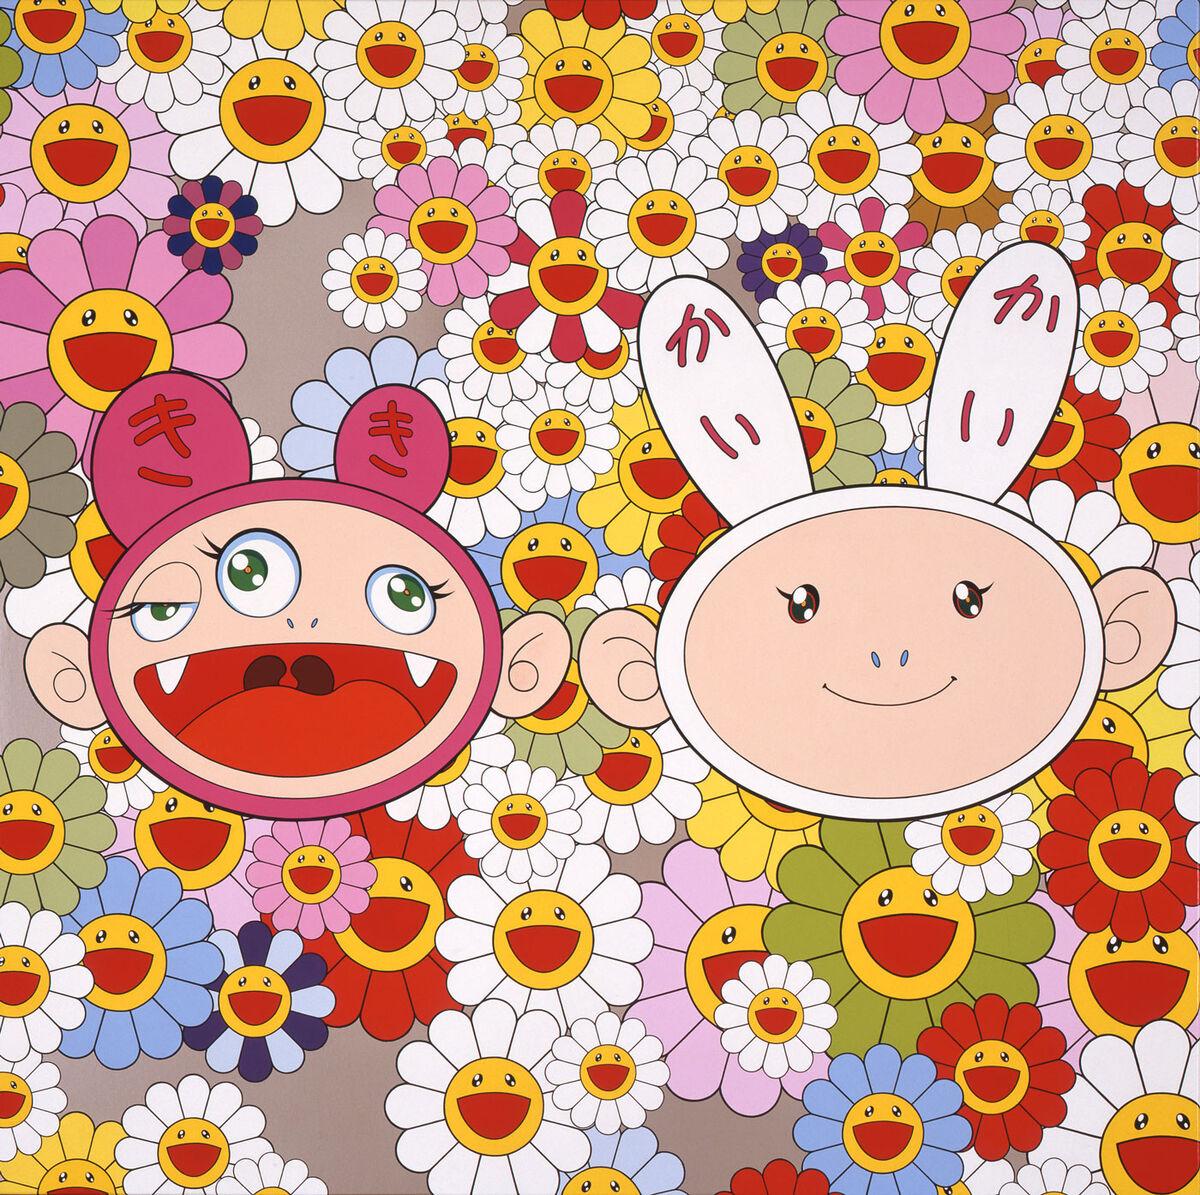 Takashi Murakami, Kaikai Kiki News, 2002. ©︎ 2002 Takashi Murakami/Kaikai Kiki Co., Ltd. All Rights Reserved. Courtesy of Gagosian.